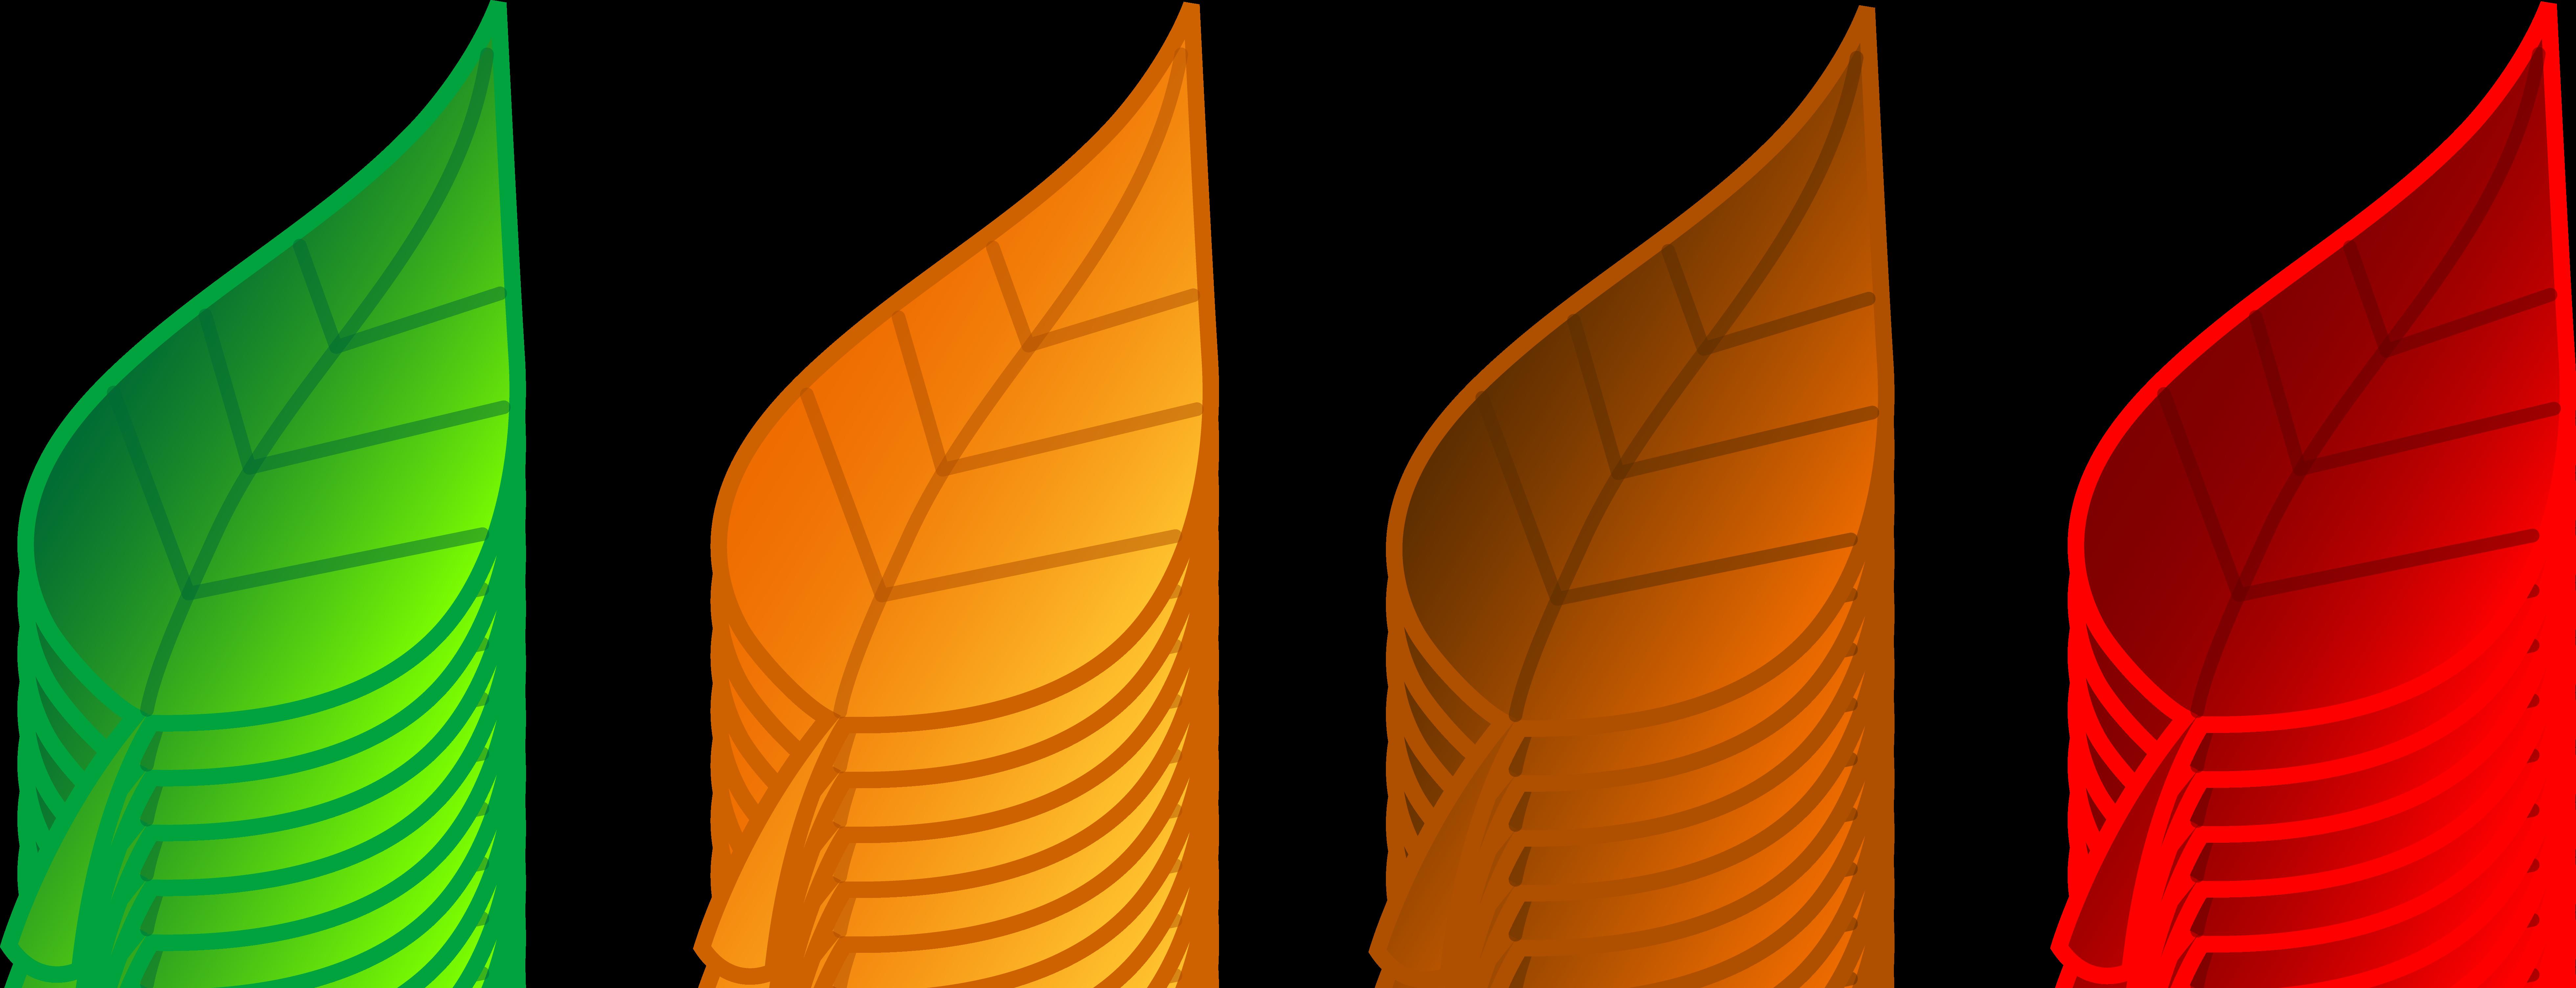 Leaf clipart Clipart Fall fall foliage clipart